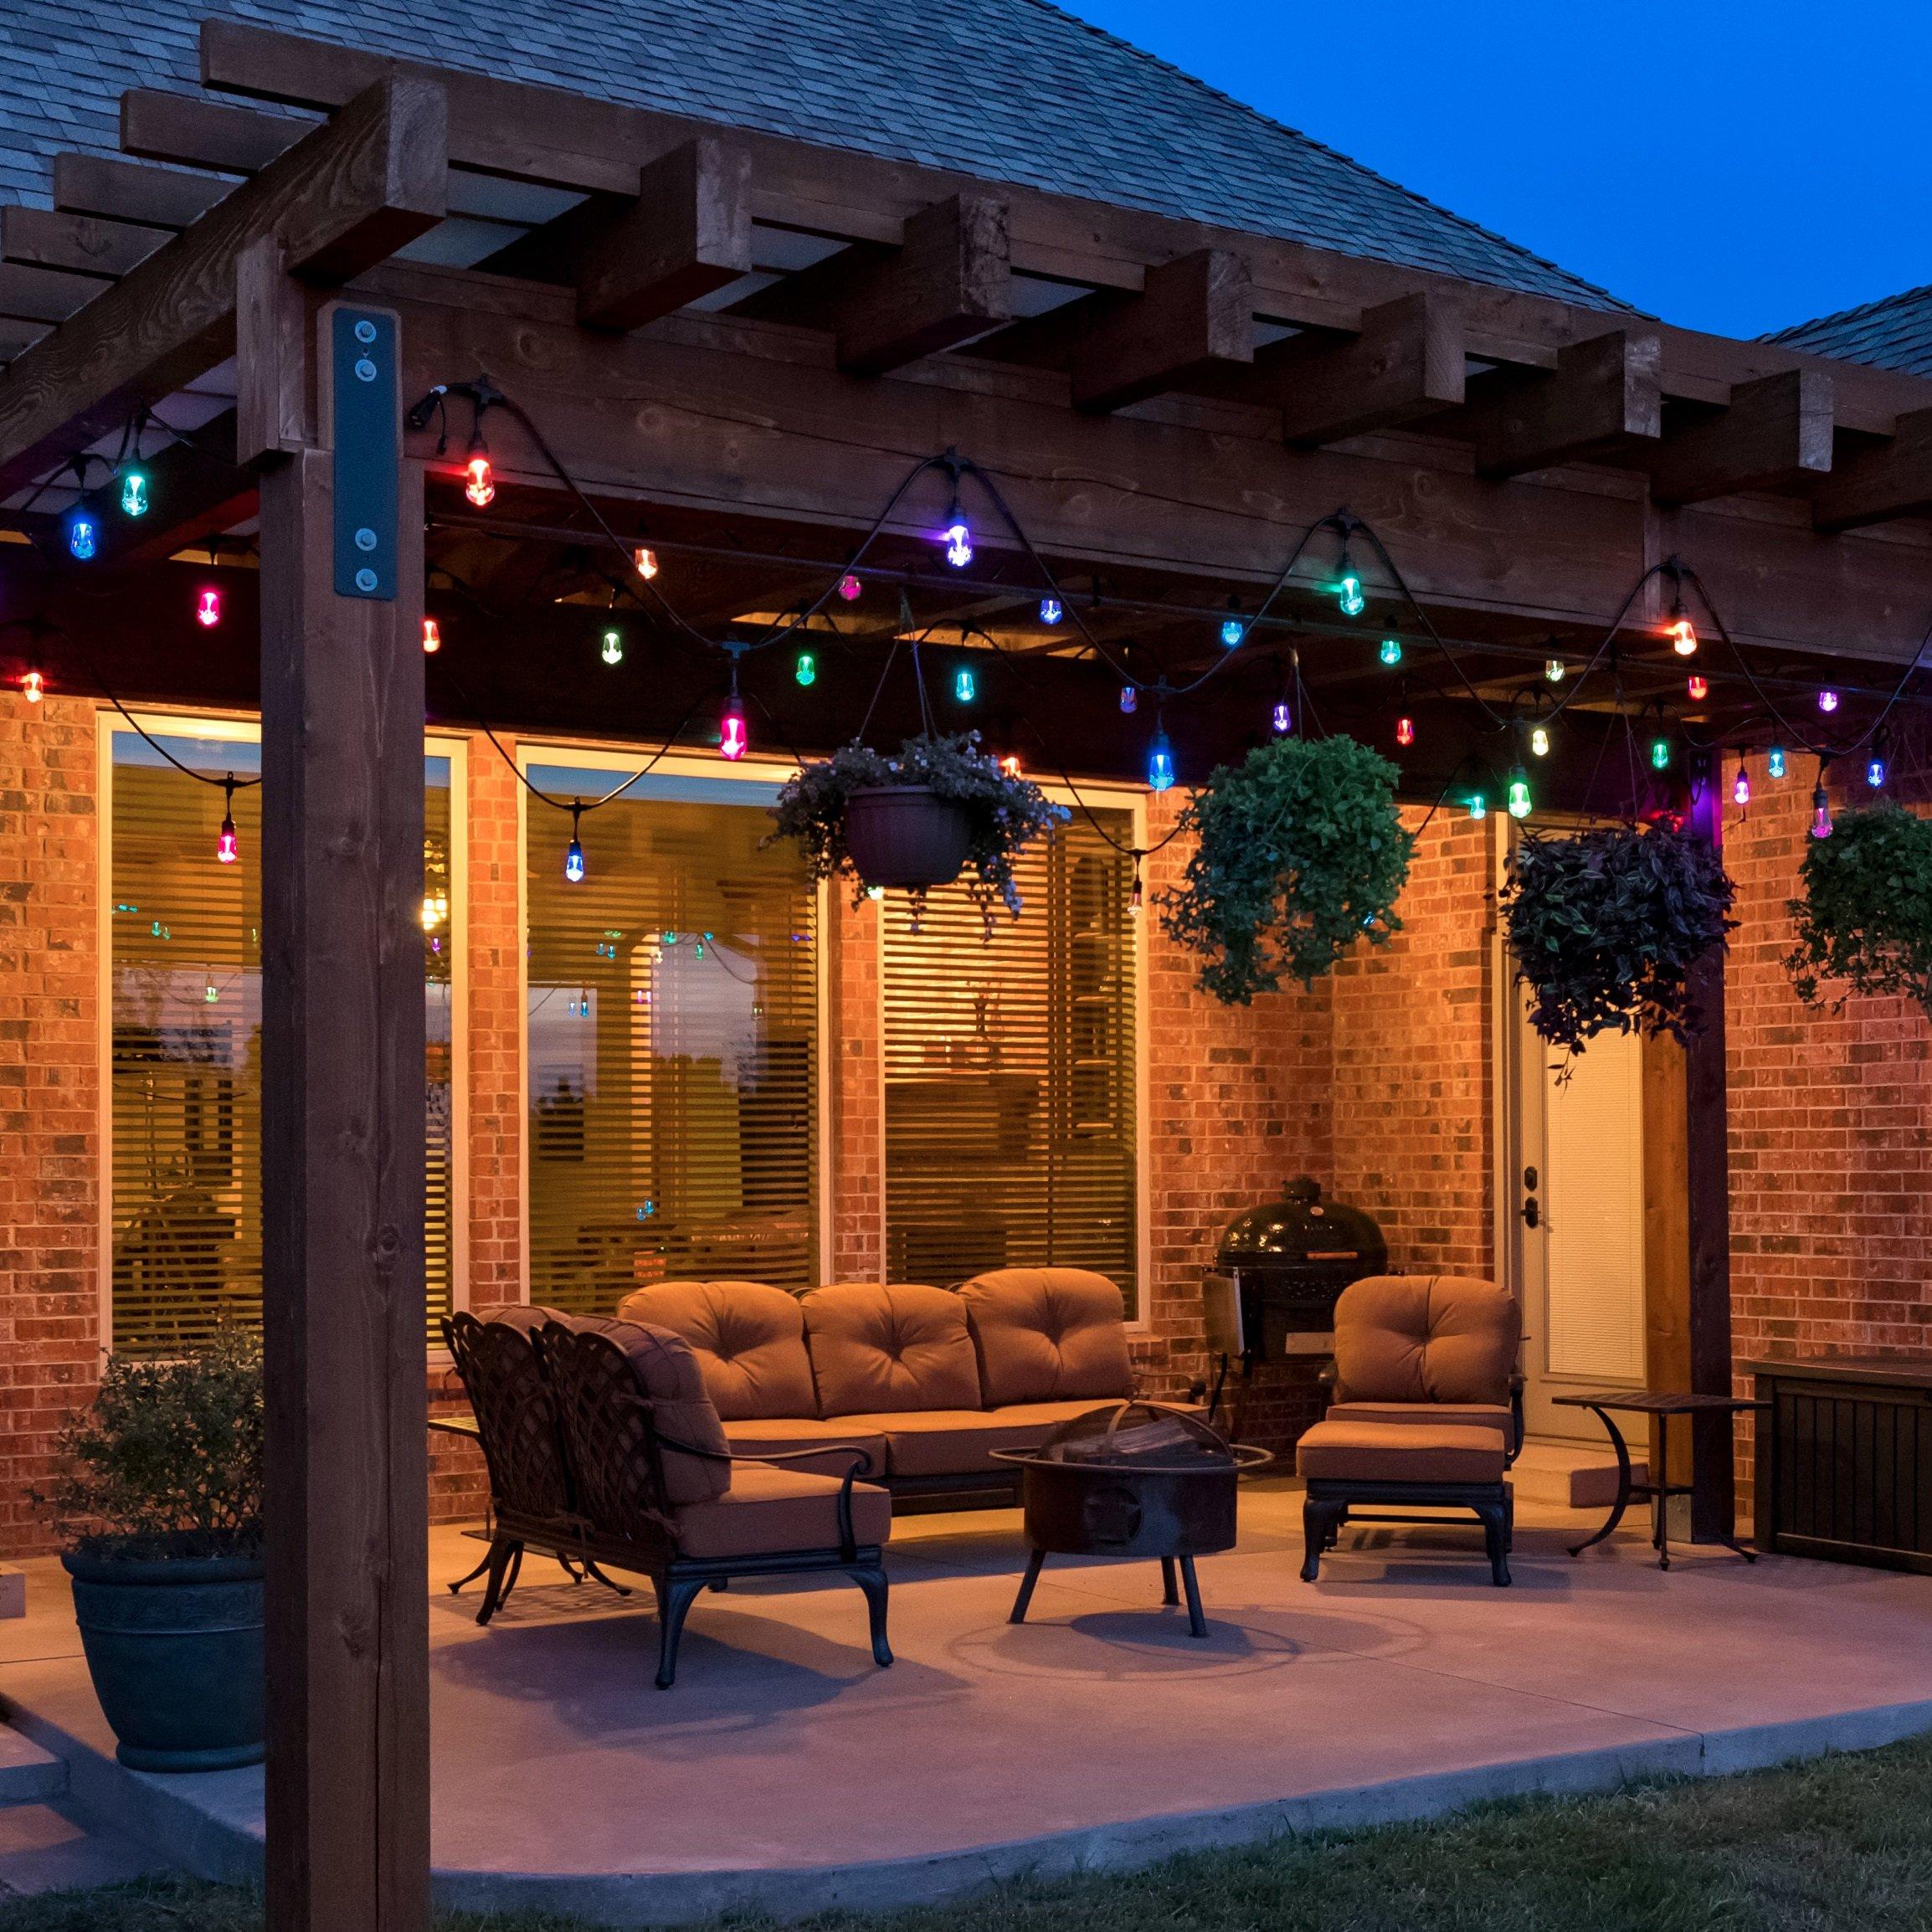 Enbrighten 37790 Vintage Seasons LED Warm White & Color Changing Café String Lights, Black, 48ft, 24 Premium Impact Resistant Lifetime Bulbs, Wireless, Weatherproof, Indoor/Outdoor, 48 ft, by Enbrighten (Image #4)